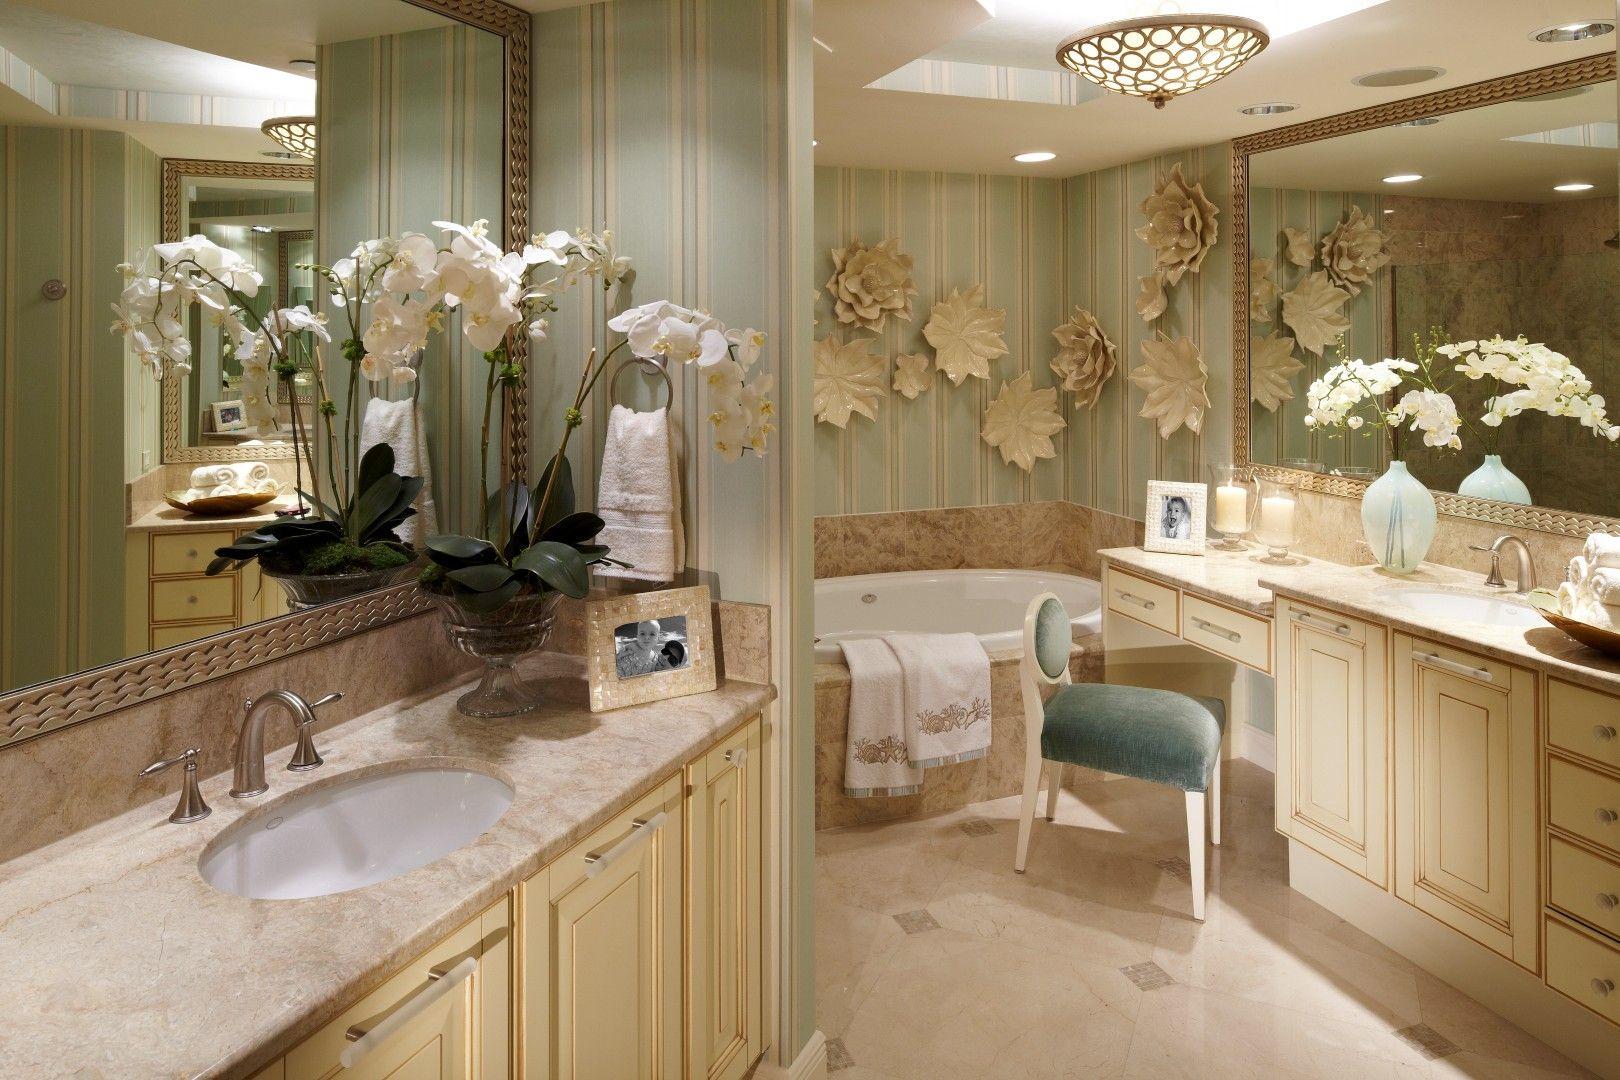 Master Bathroom  Bathrooms  Pinterest  Master bathrooms Bathroom